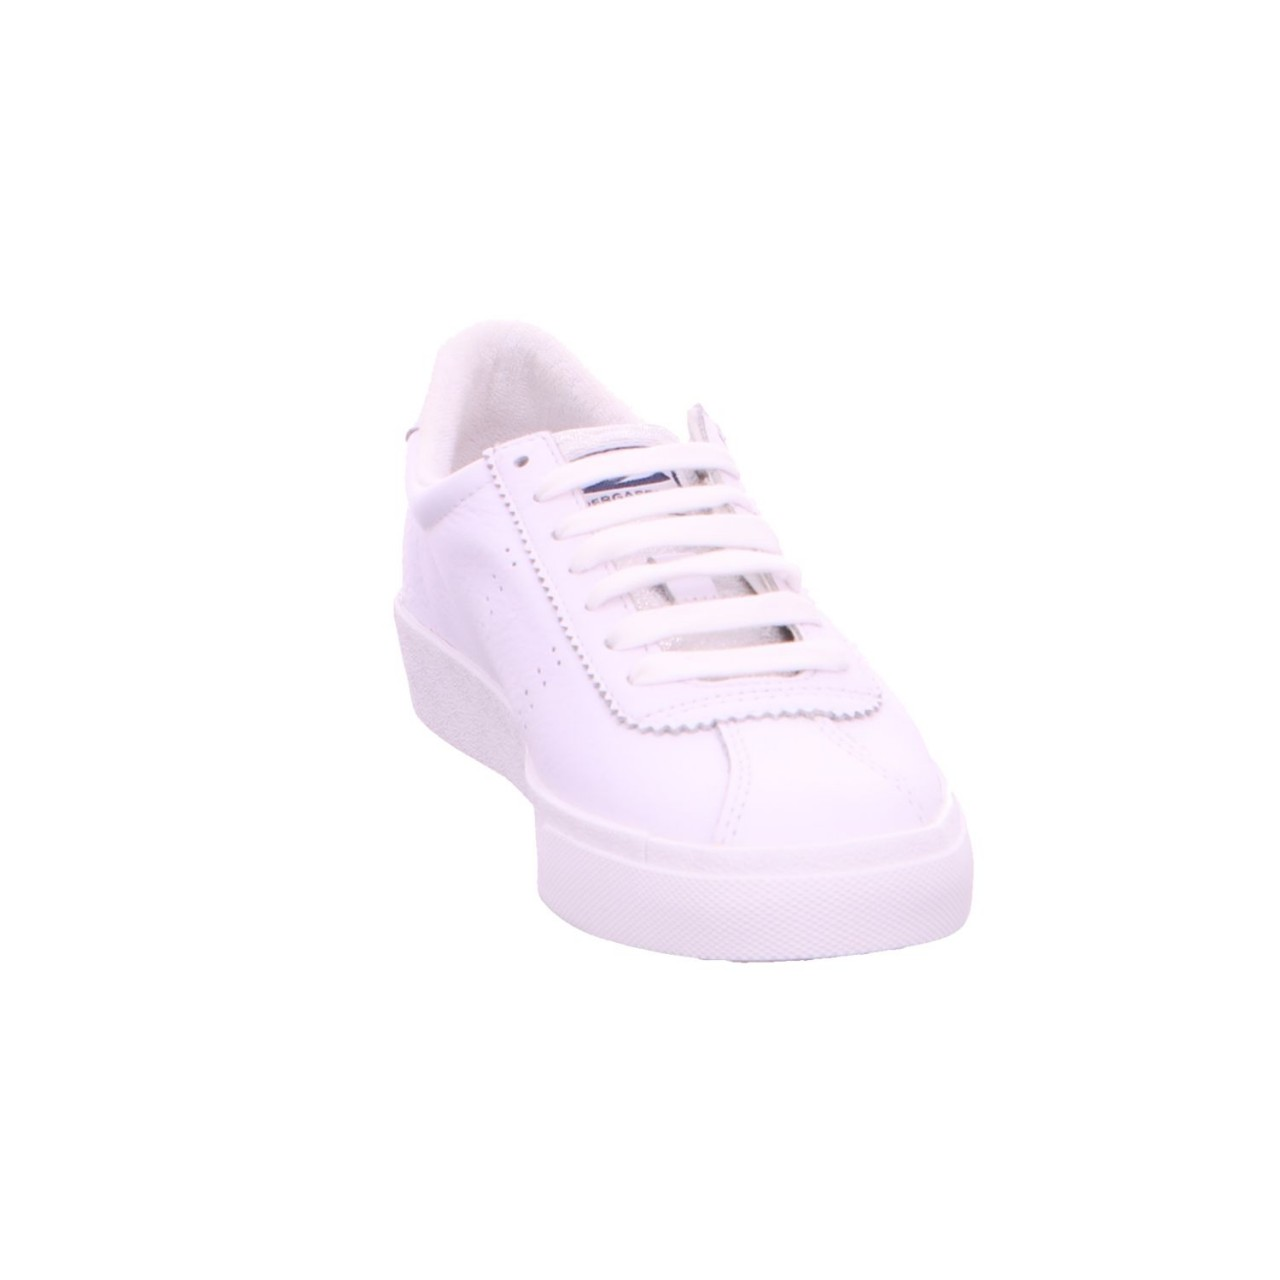 wei Sneaker Sneaker weiss weiss wei Superga Sneaker Superga weiss wei Superga Superga w6x1d10